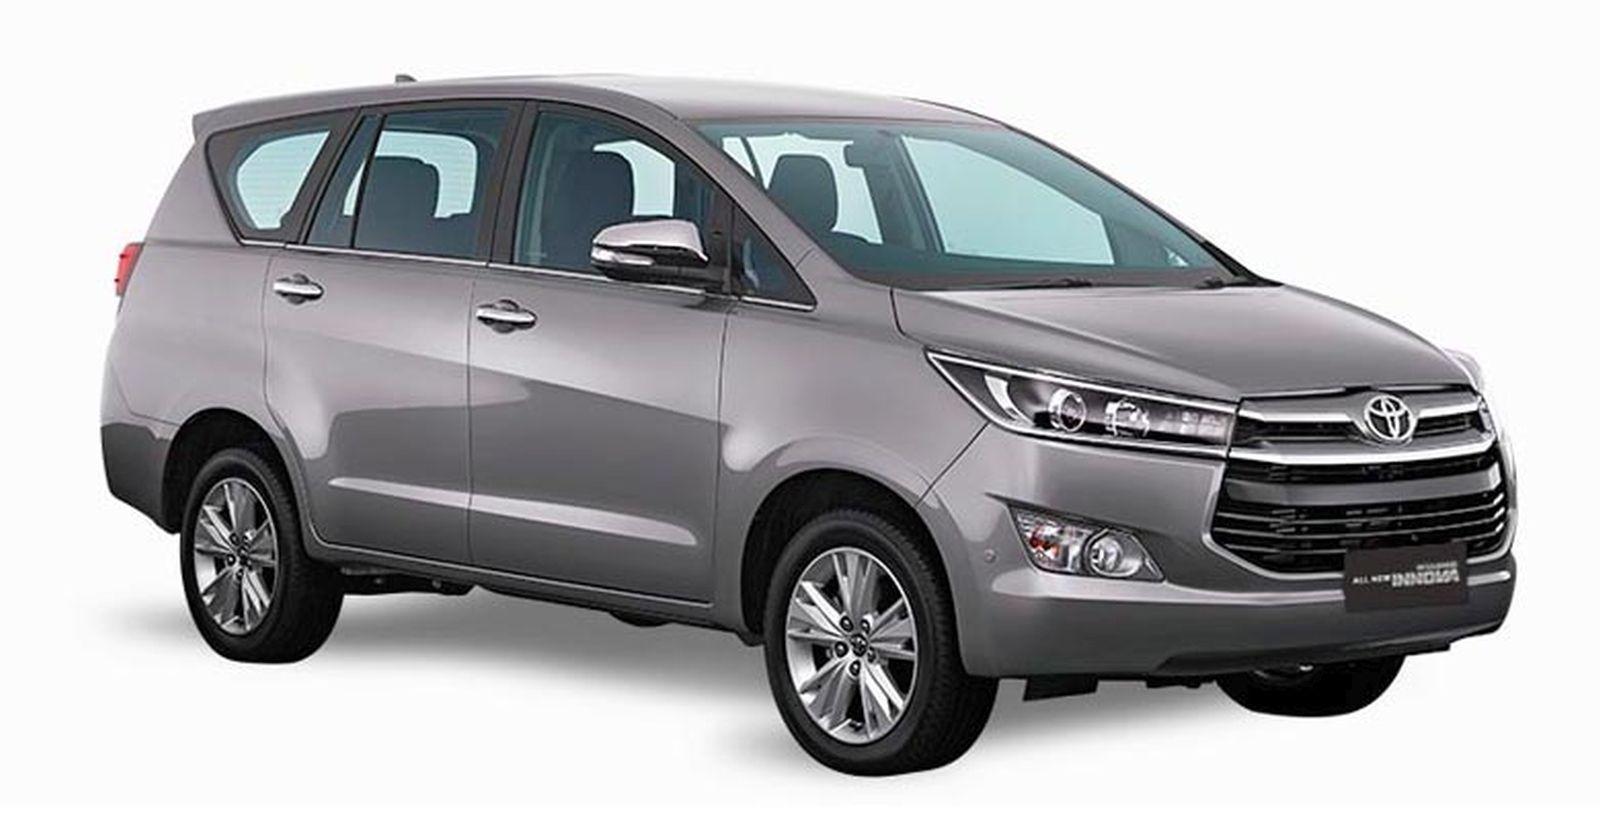 Toyota New Innova February 2016 10 15 Lakh Upcoming Cars In